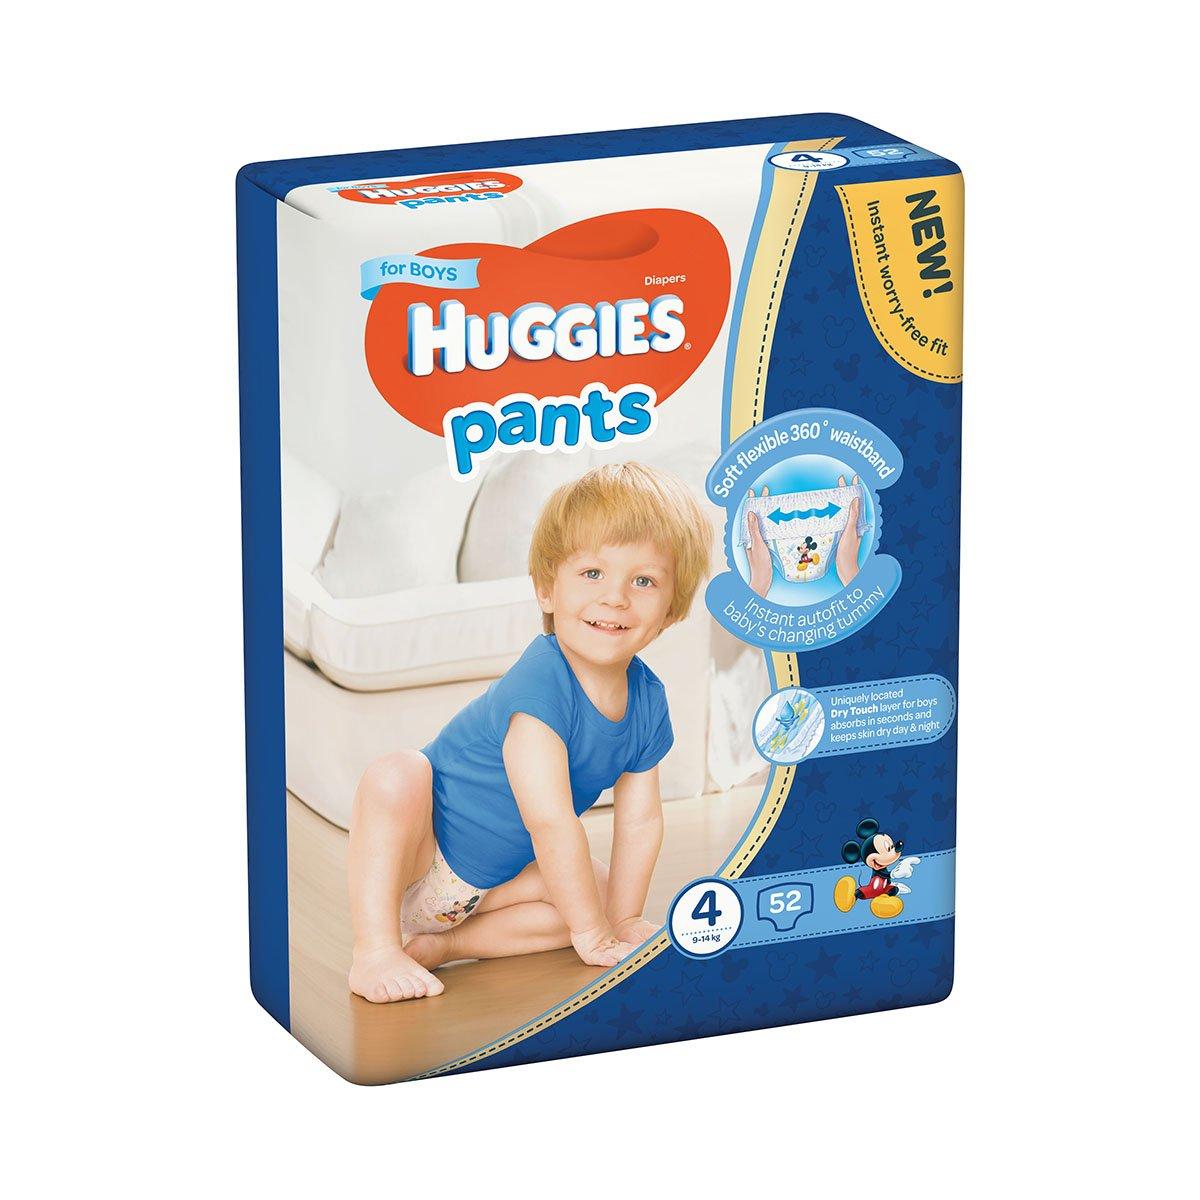 Scutece Huggies Mega Pants Boys, Nr 4, 9 - 14 Kg, 52 buc imagine